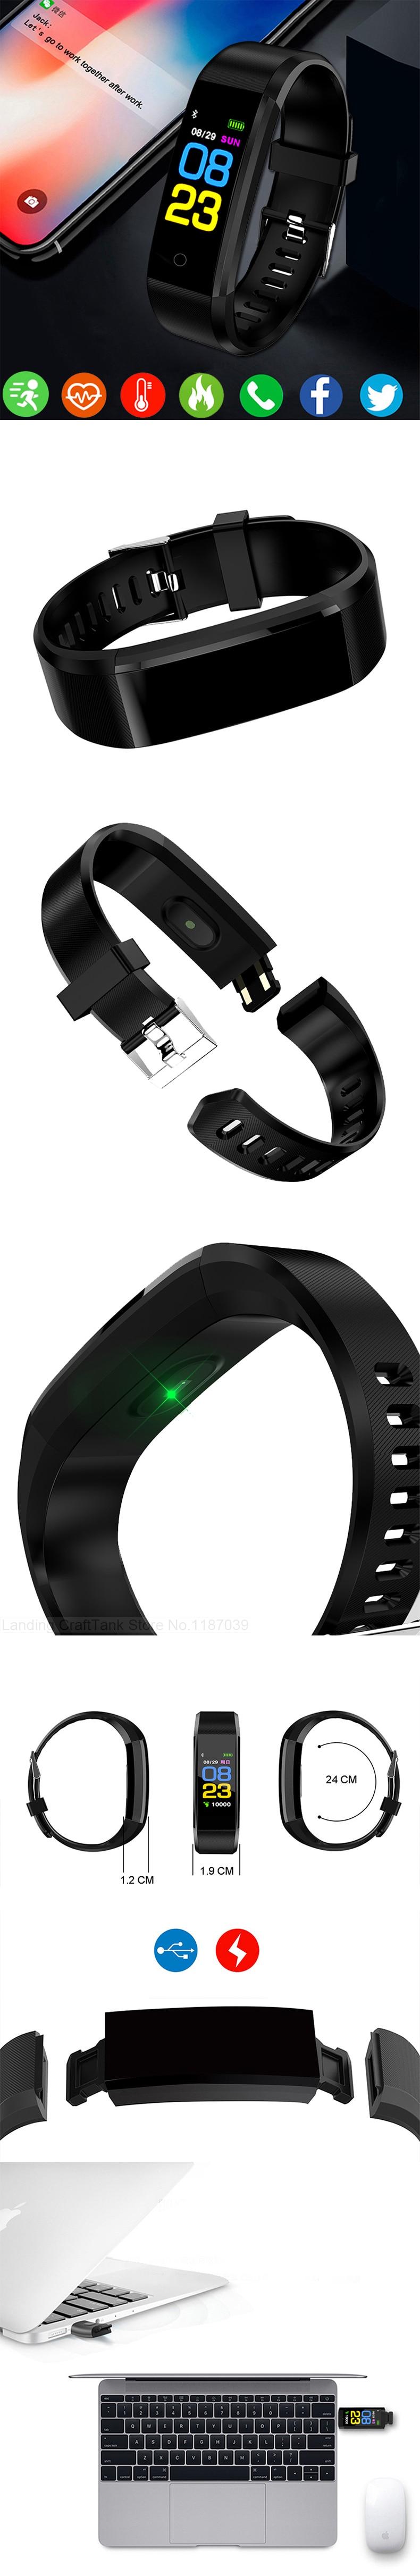 Armband Smart Uhr Männer Sport Led Digital Uhren Elektronische Neue Armbanduhr Für Männer Uhr Männliche Armbanduhr Hodinky Mann Reloges Herrenuhren Digitale Uhren